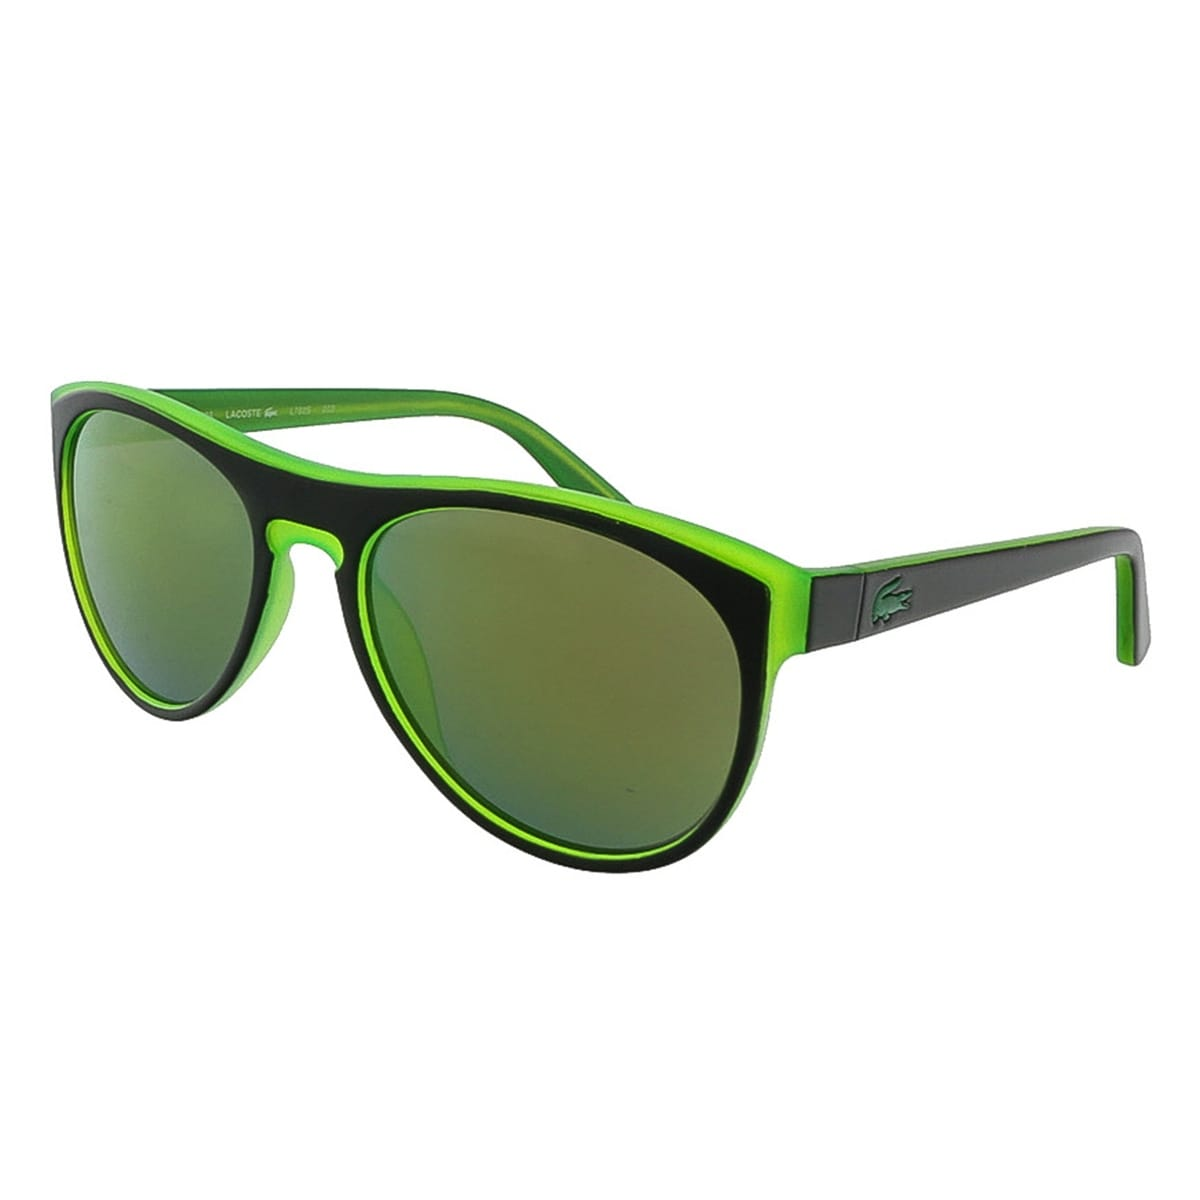 1a049c4c75b7 Lacoste Sunglasses